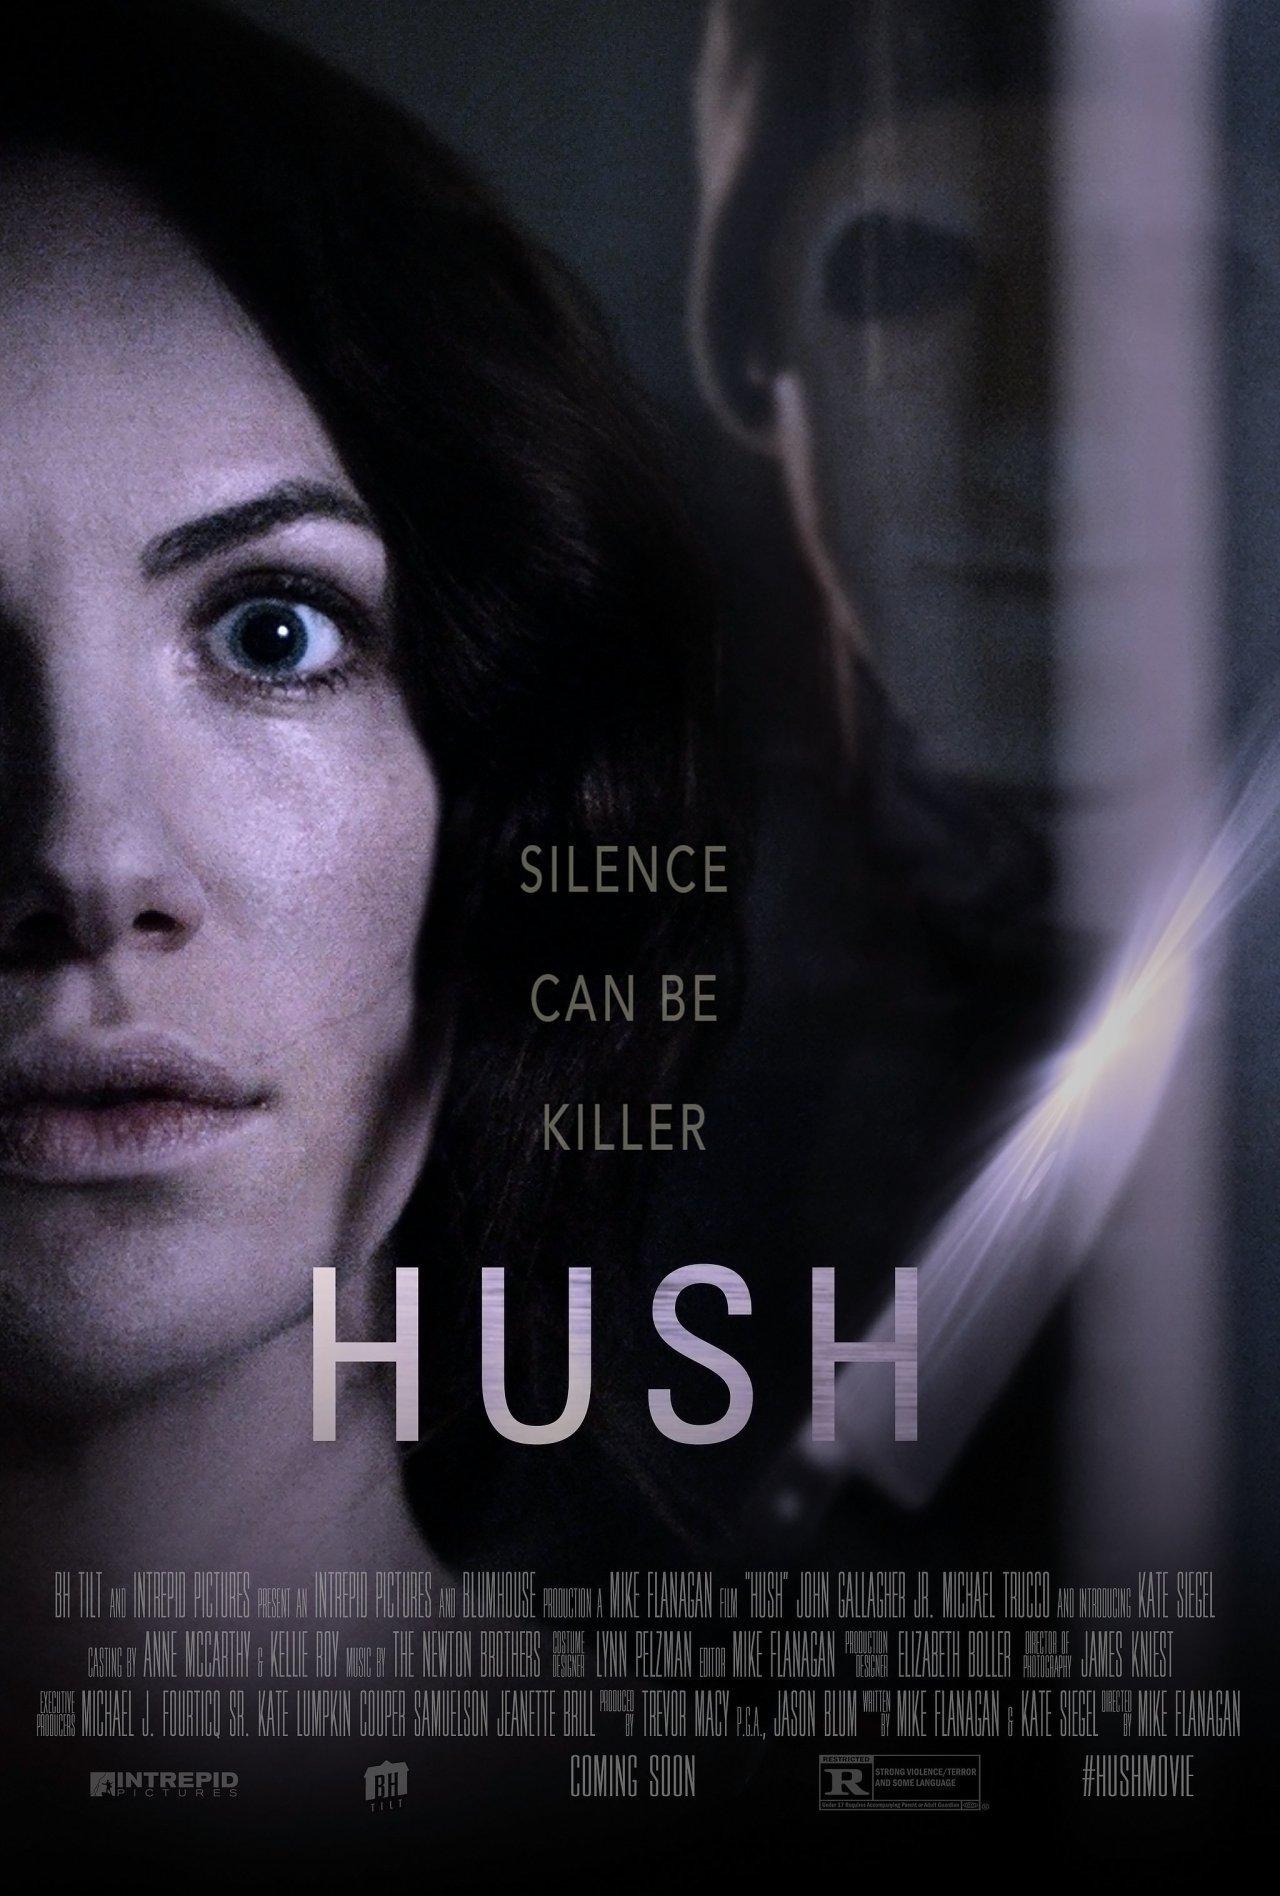 hush movie poster 2016